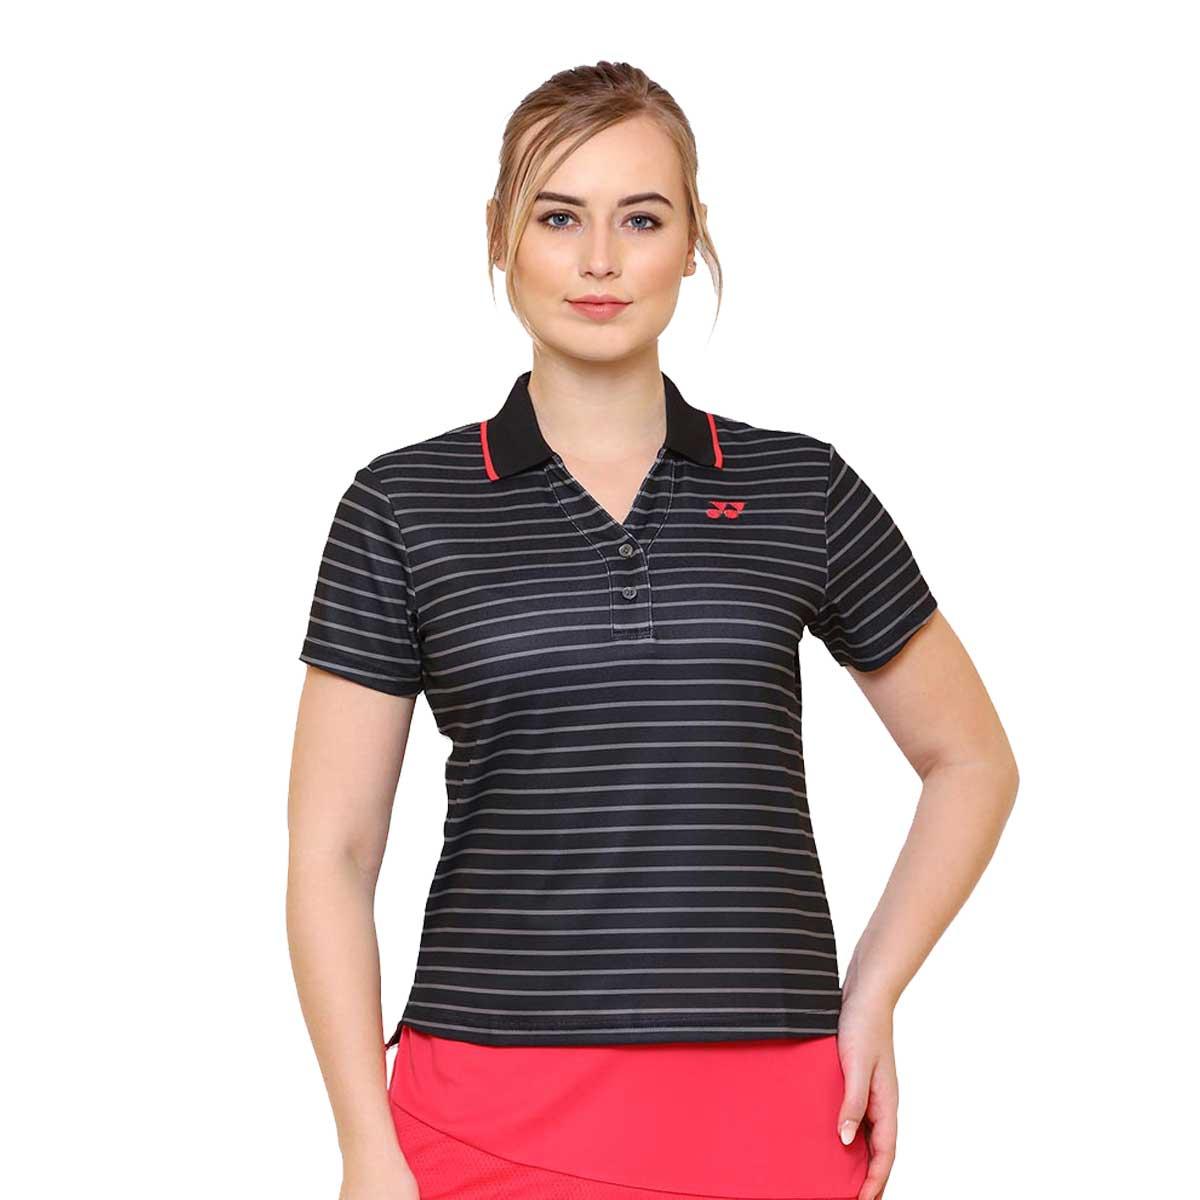 a1a904a07cb Buy Yonex Womens Polo T-Shirt Online India